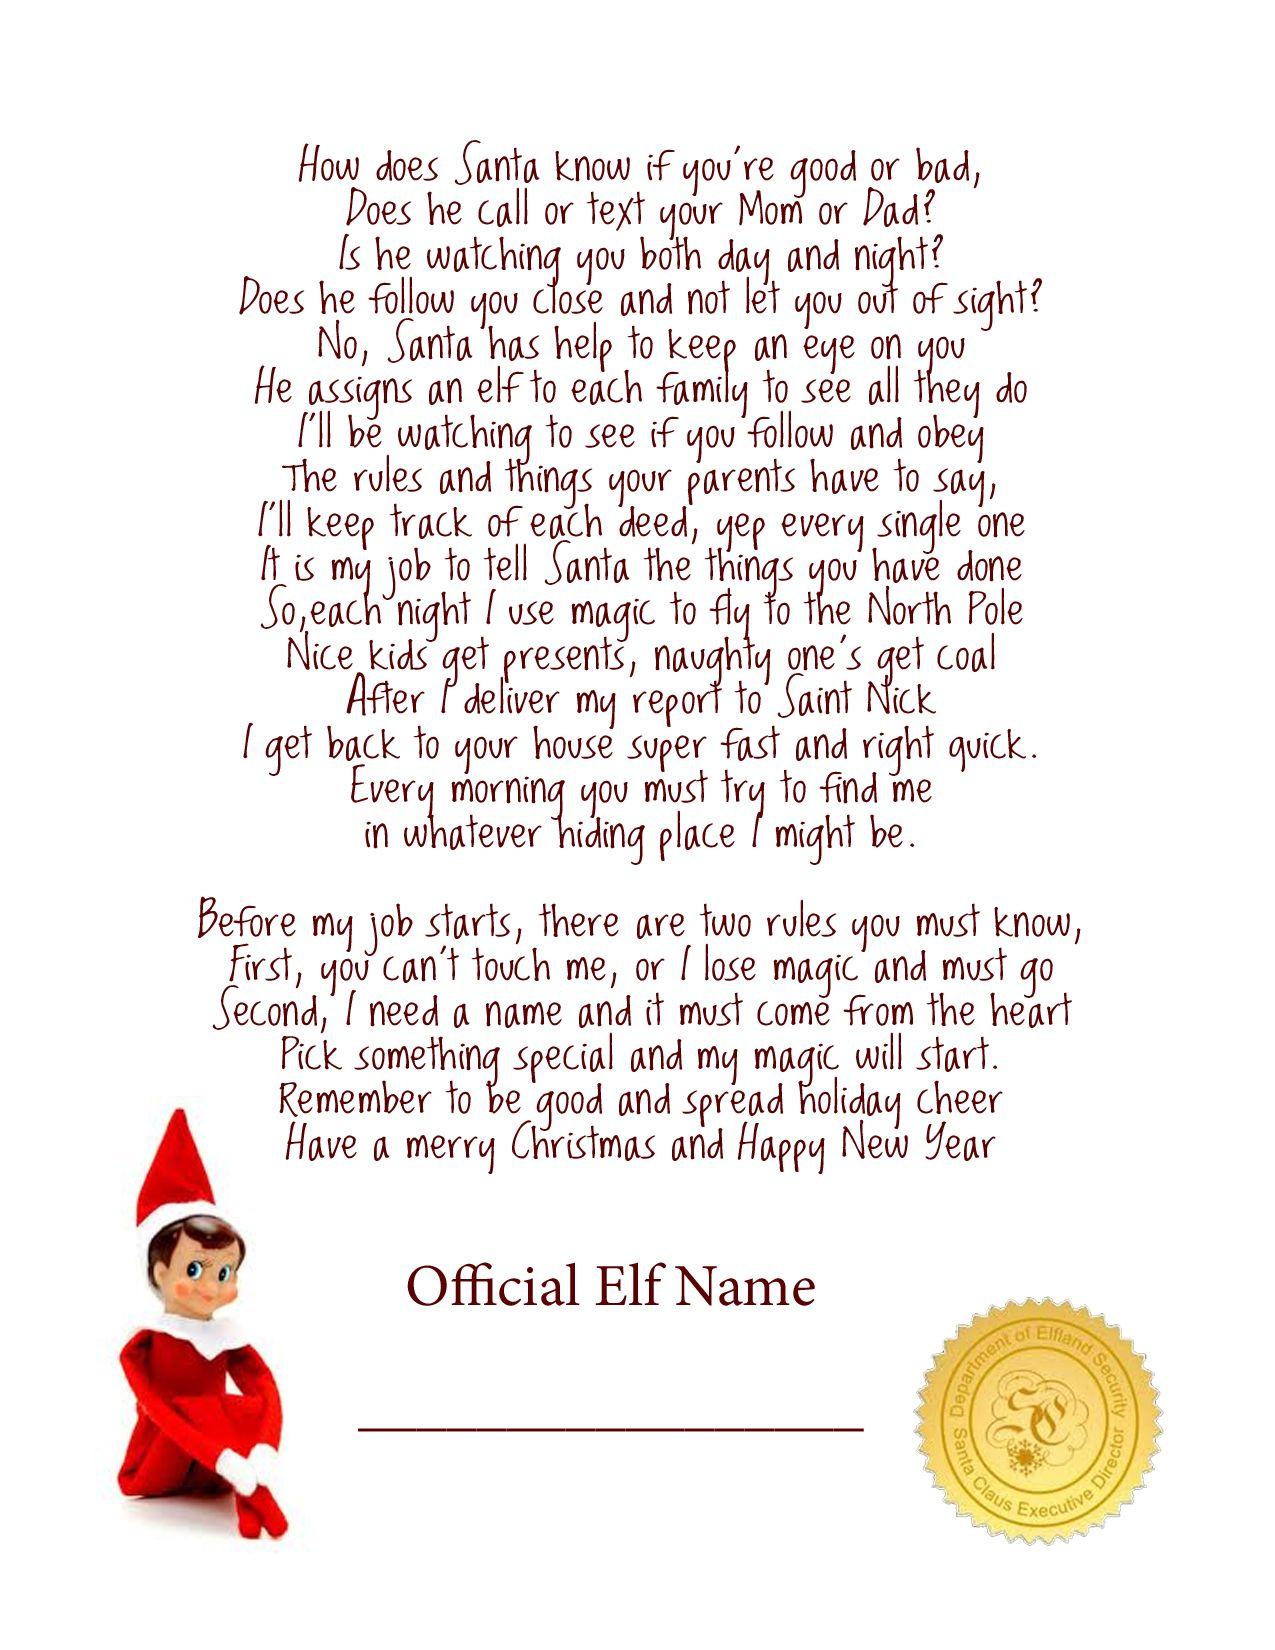 Elf On The Shelf Story - Free Printable Poem | Elf On The Shelf - Free Printable Elf On The Shelf Story